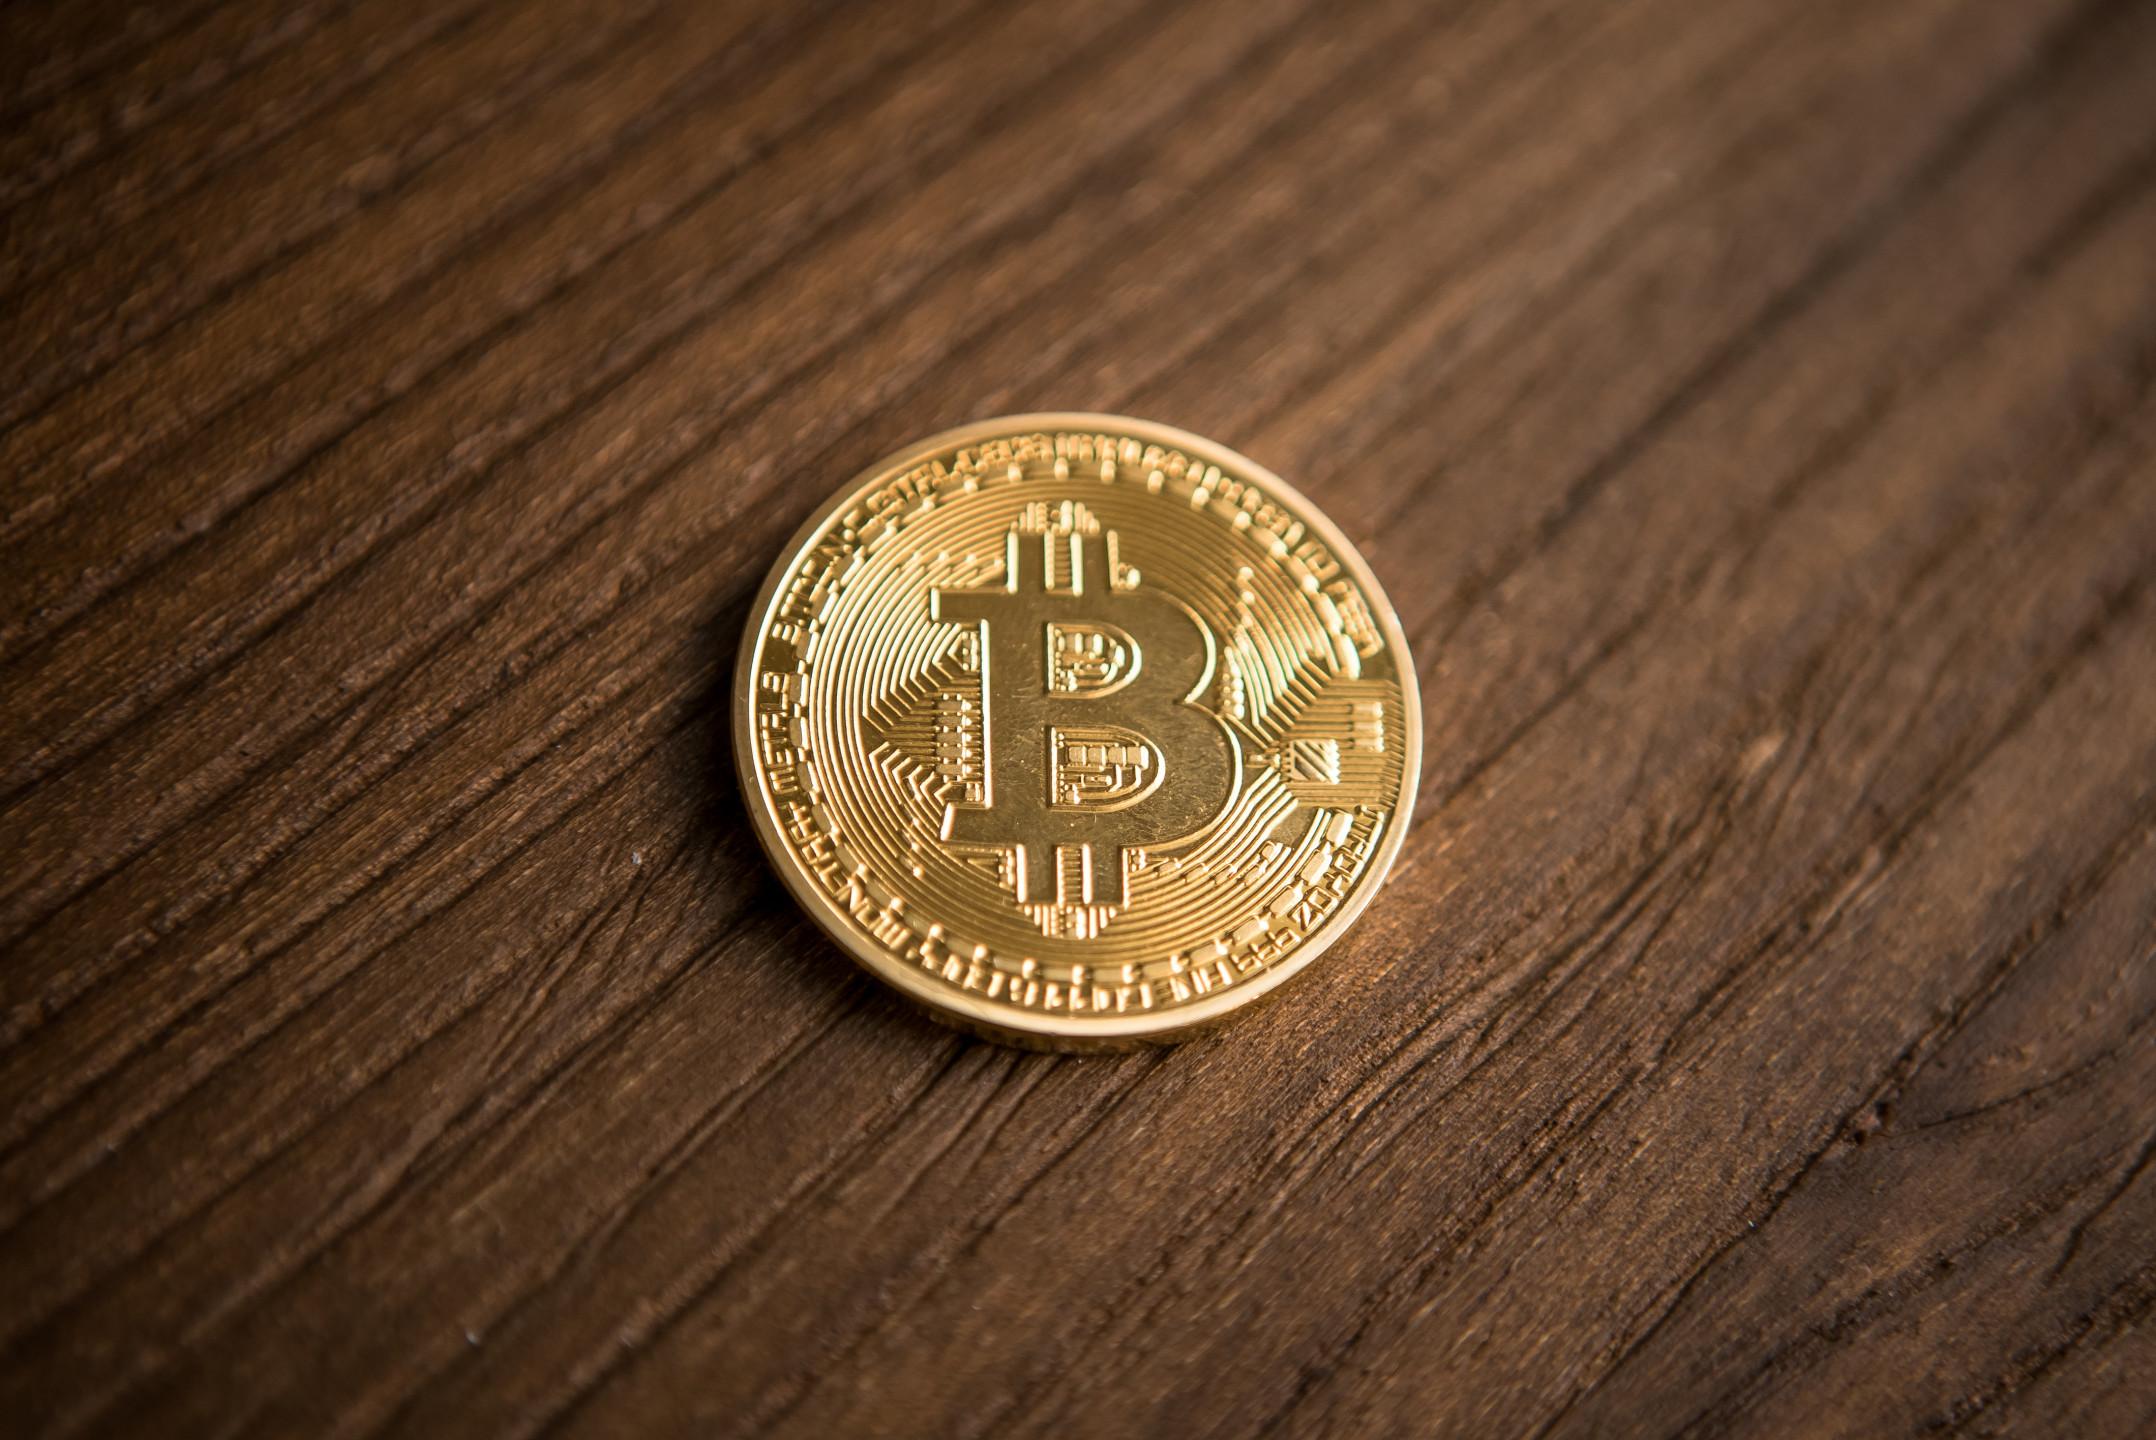 Bitcoin price intraday bullish above $3,975